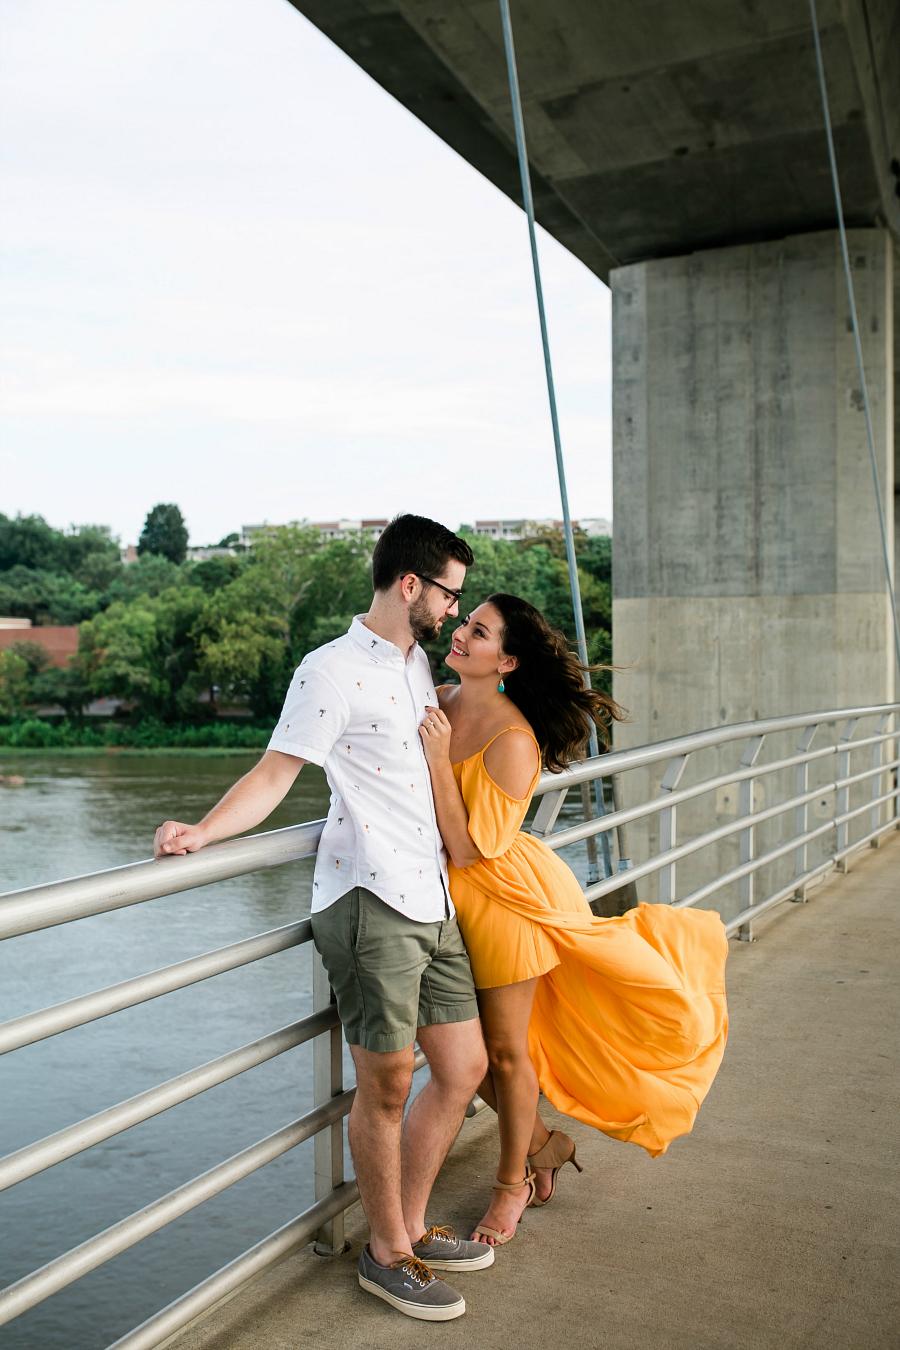 Belle Isle Foot Bridge in Richmond Virginia